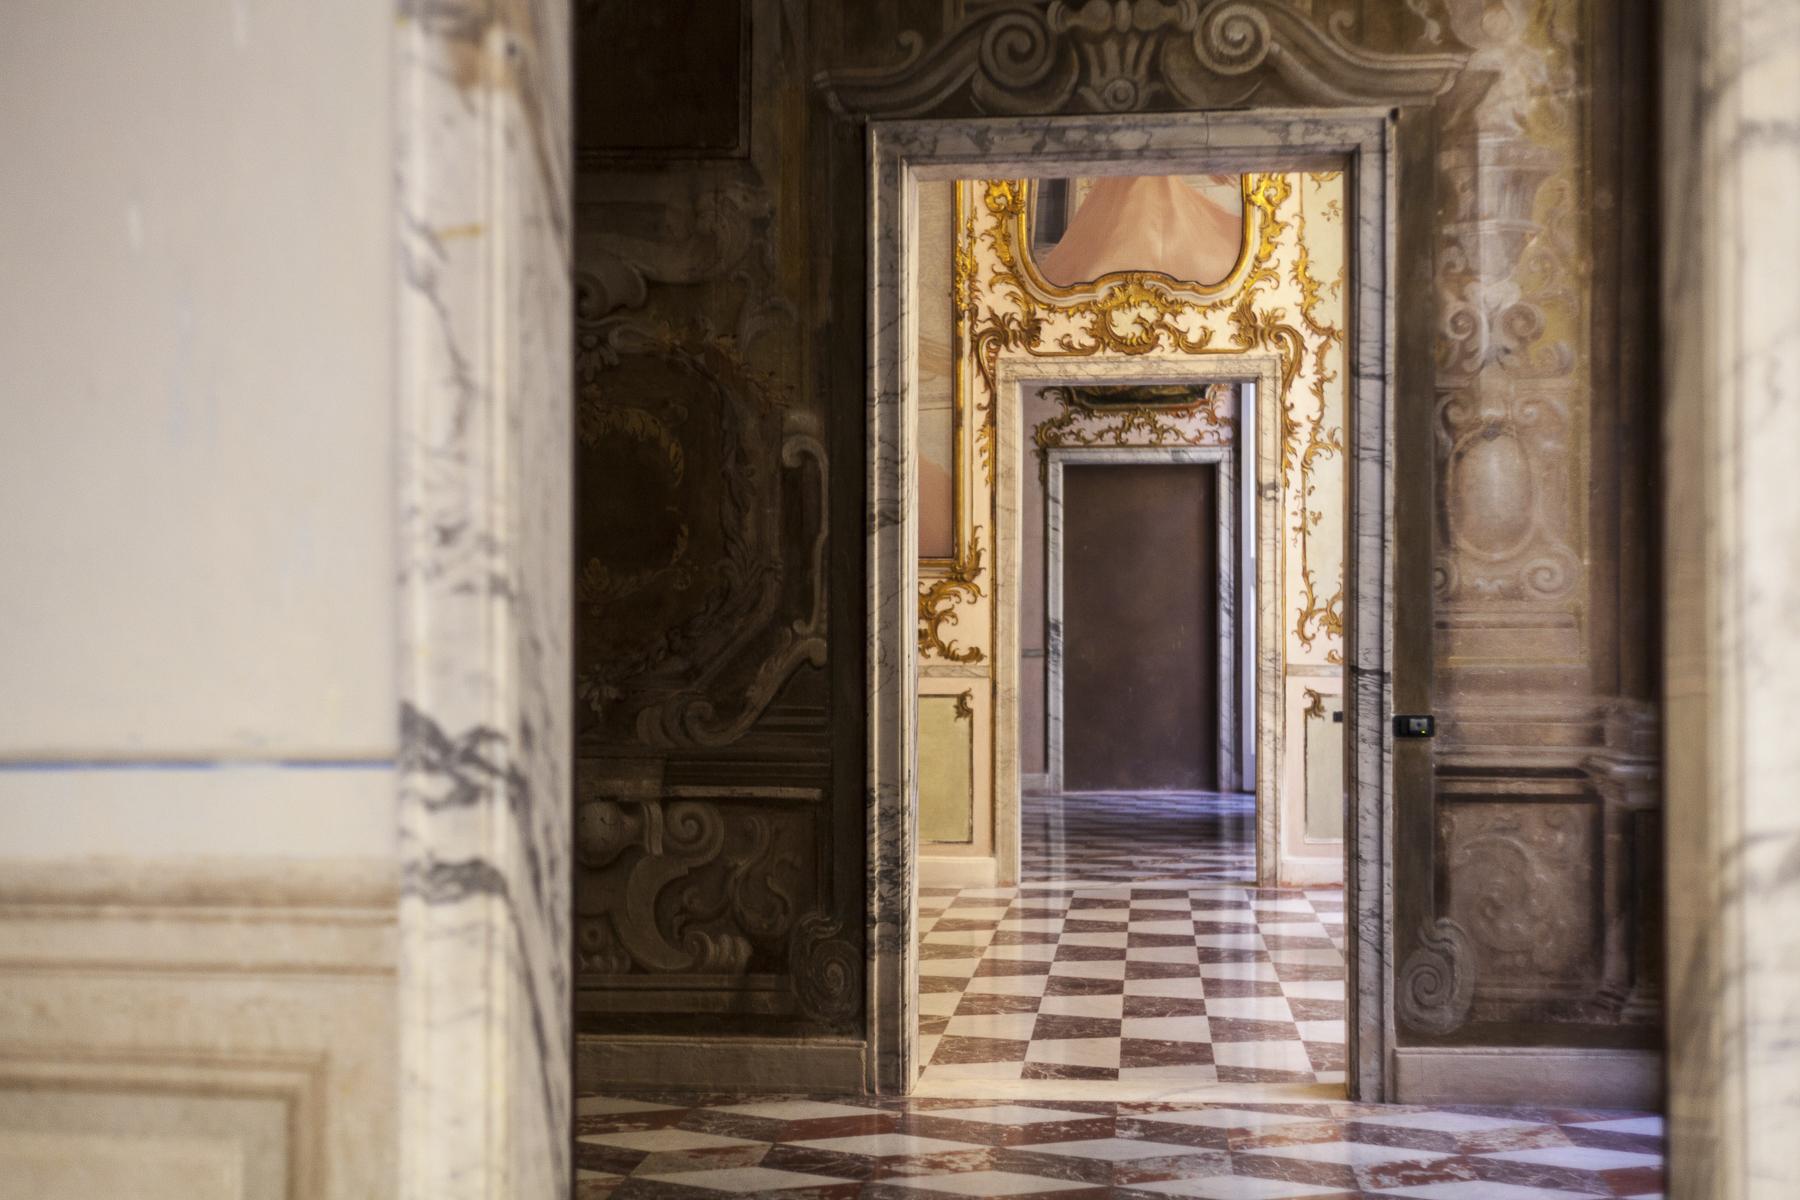 Apartment for Sale at Highly representative apartment Piazza Ferretto Genoa, Genoa 16123 Italy